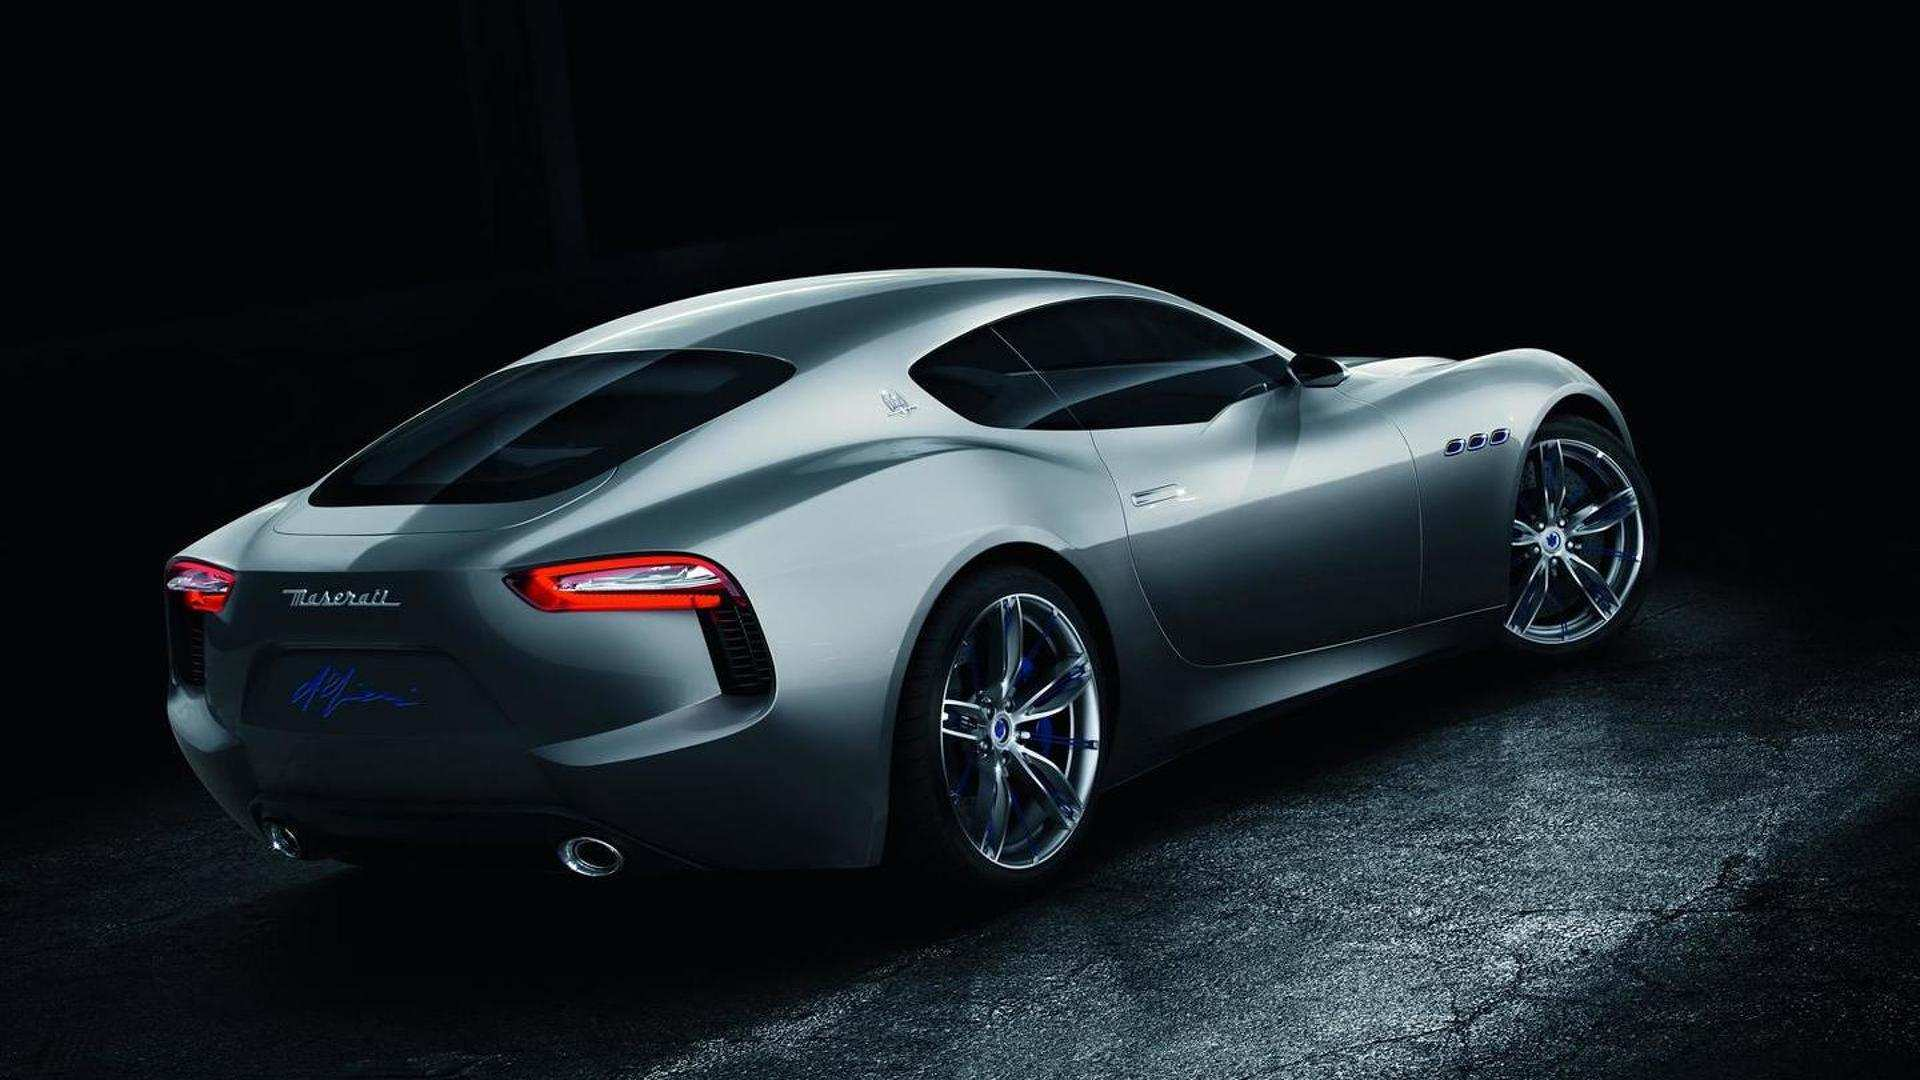 16 New New Maserati 2020 History for New Maserati 2020